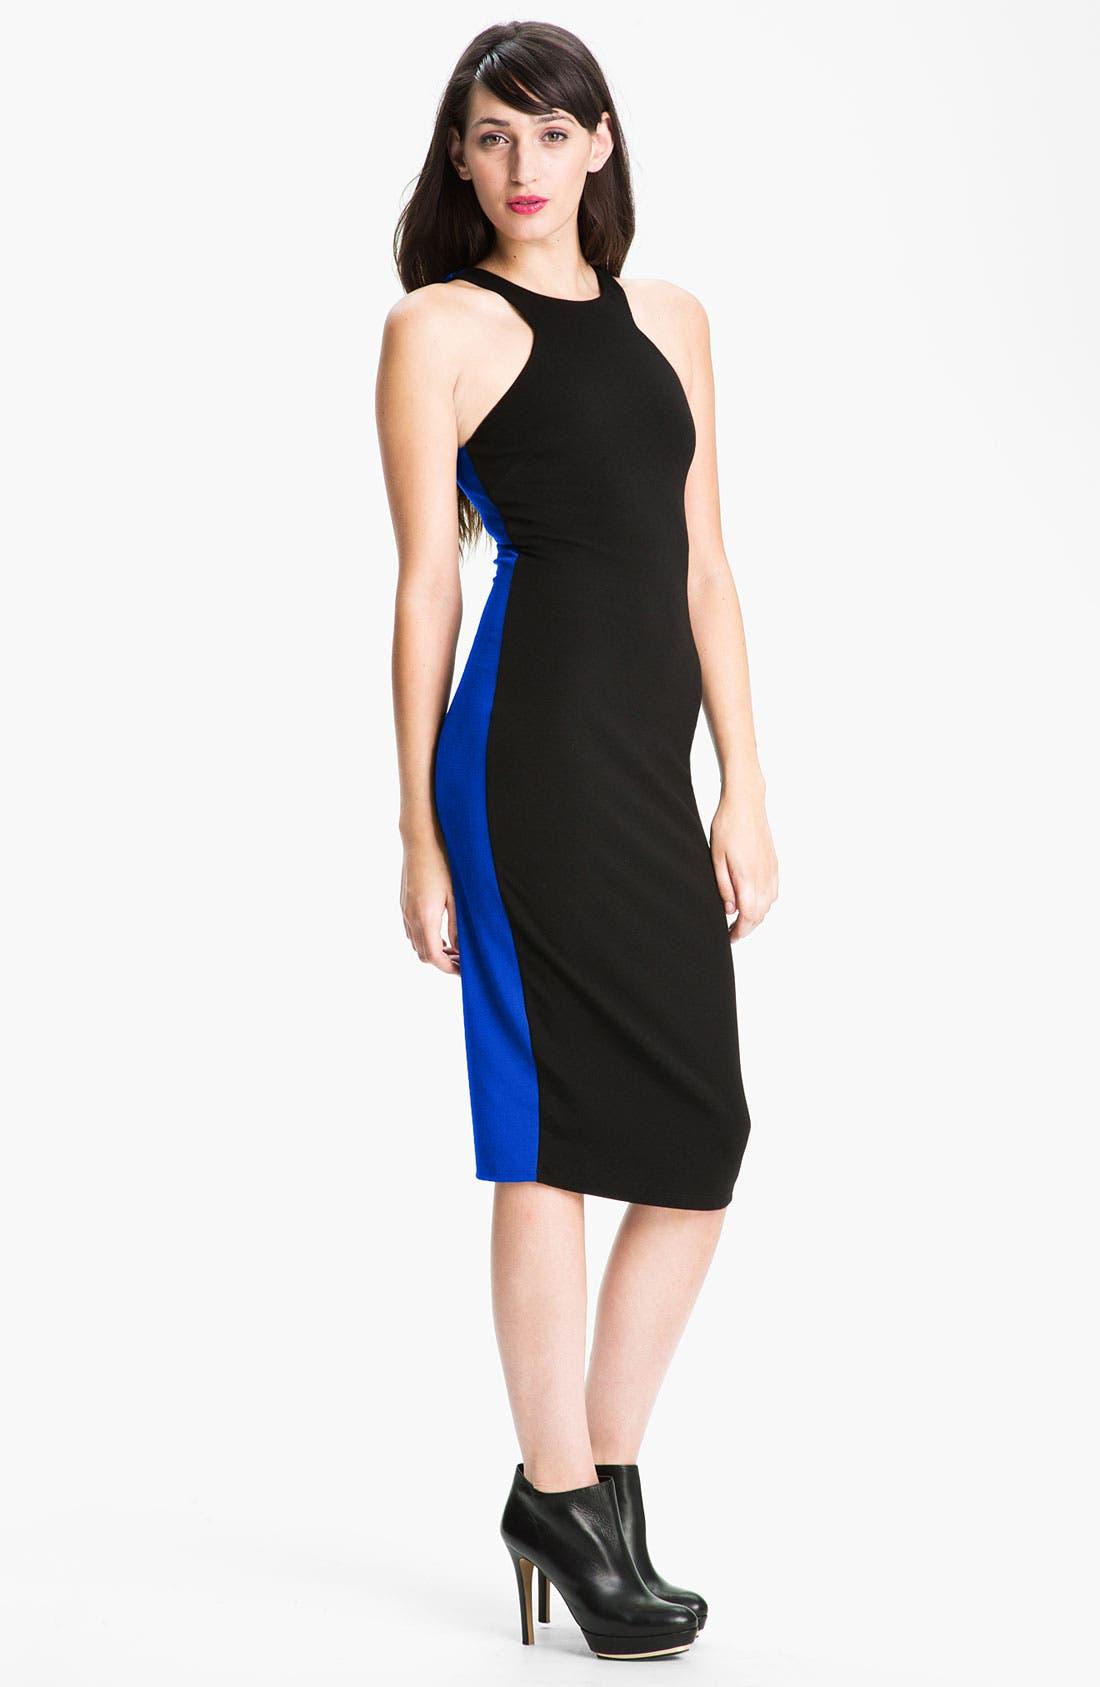 Alternate Image 1 Selected - Felicity & Coco Colorblock Racerback Sheath Dress (Nordstrom Exclusive)